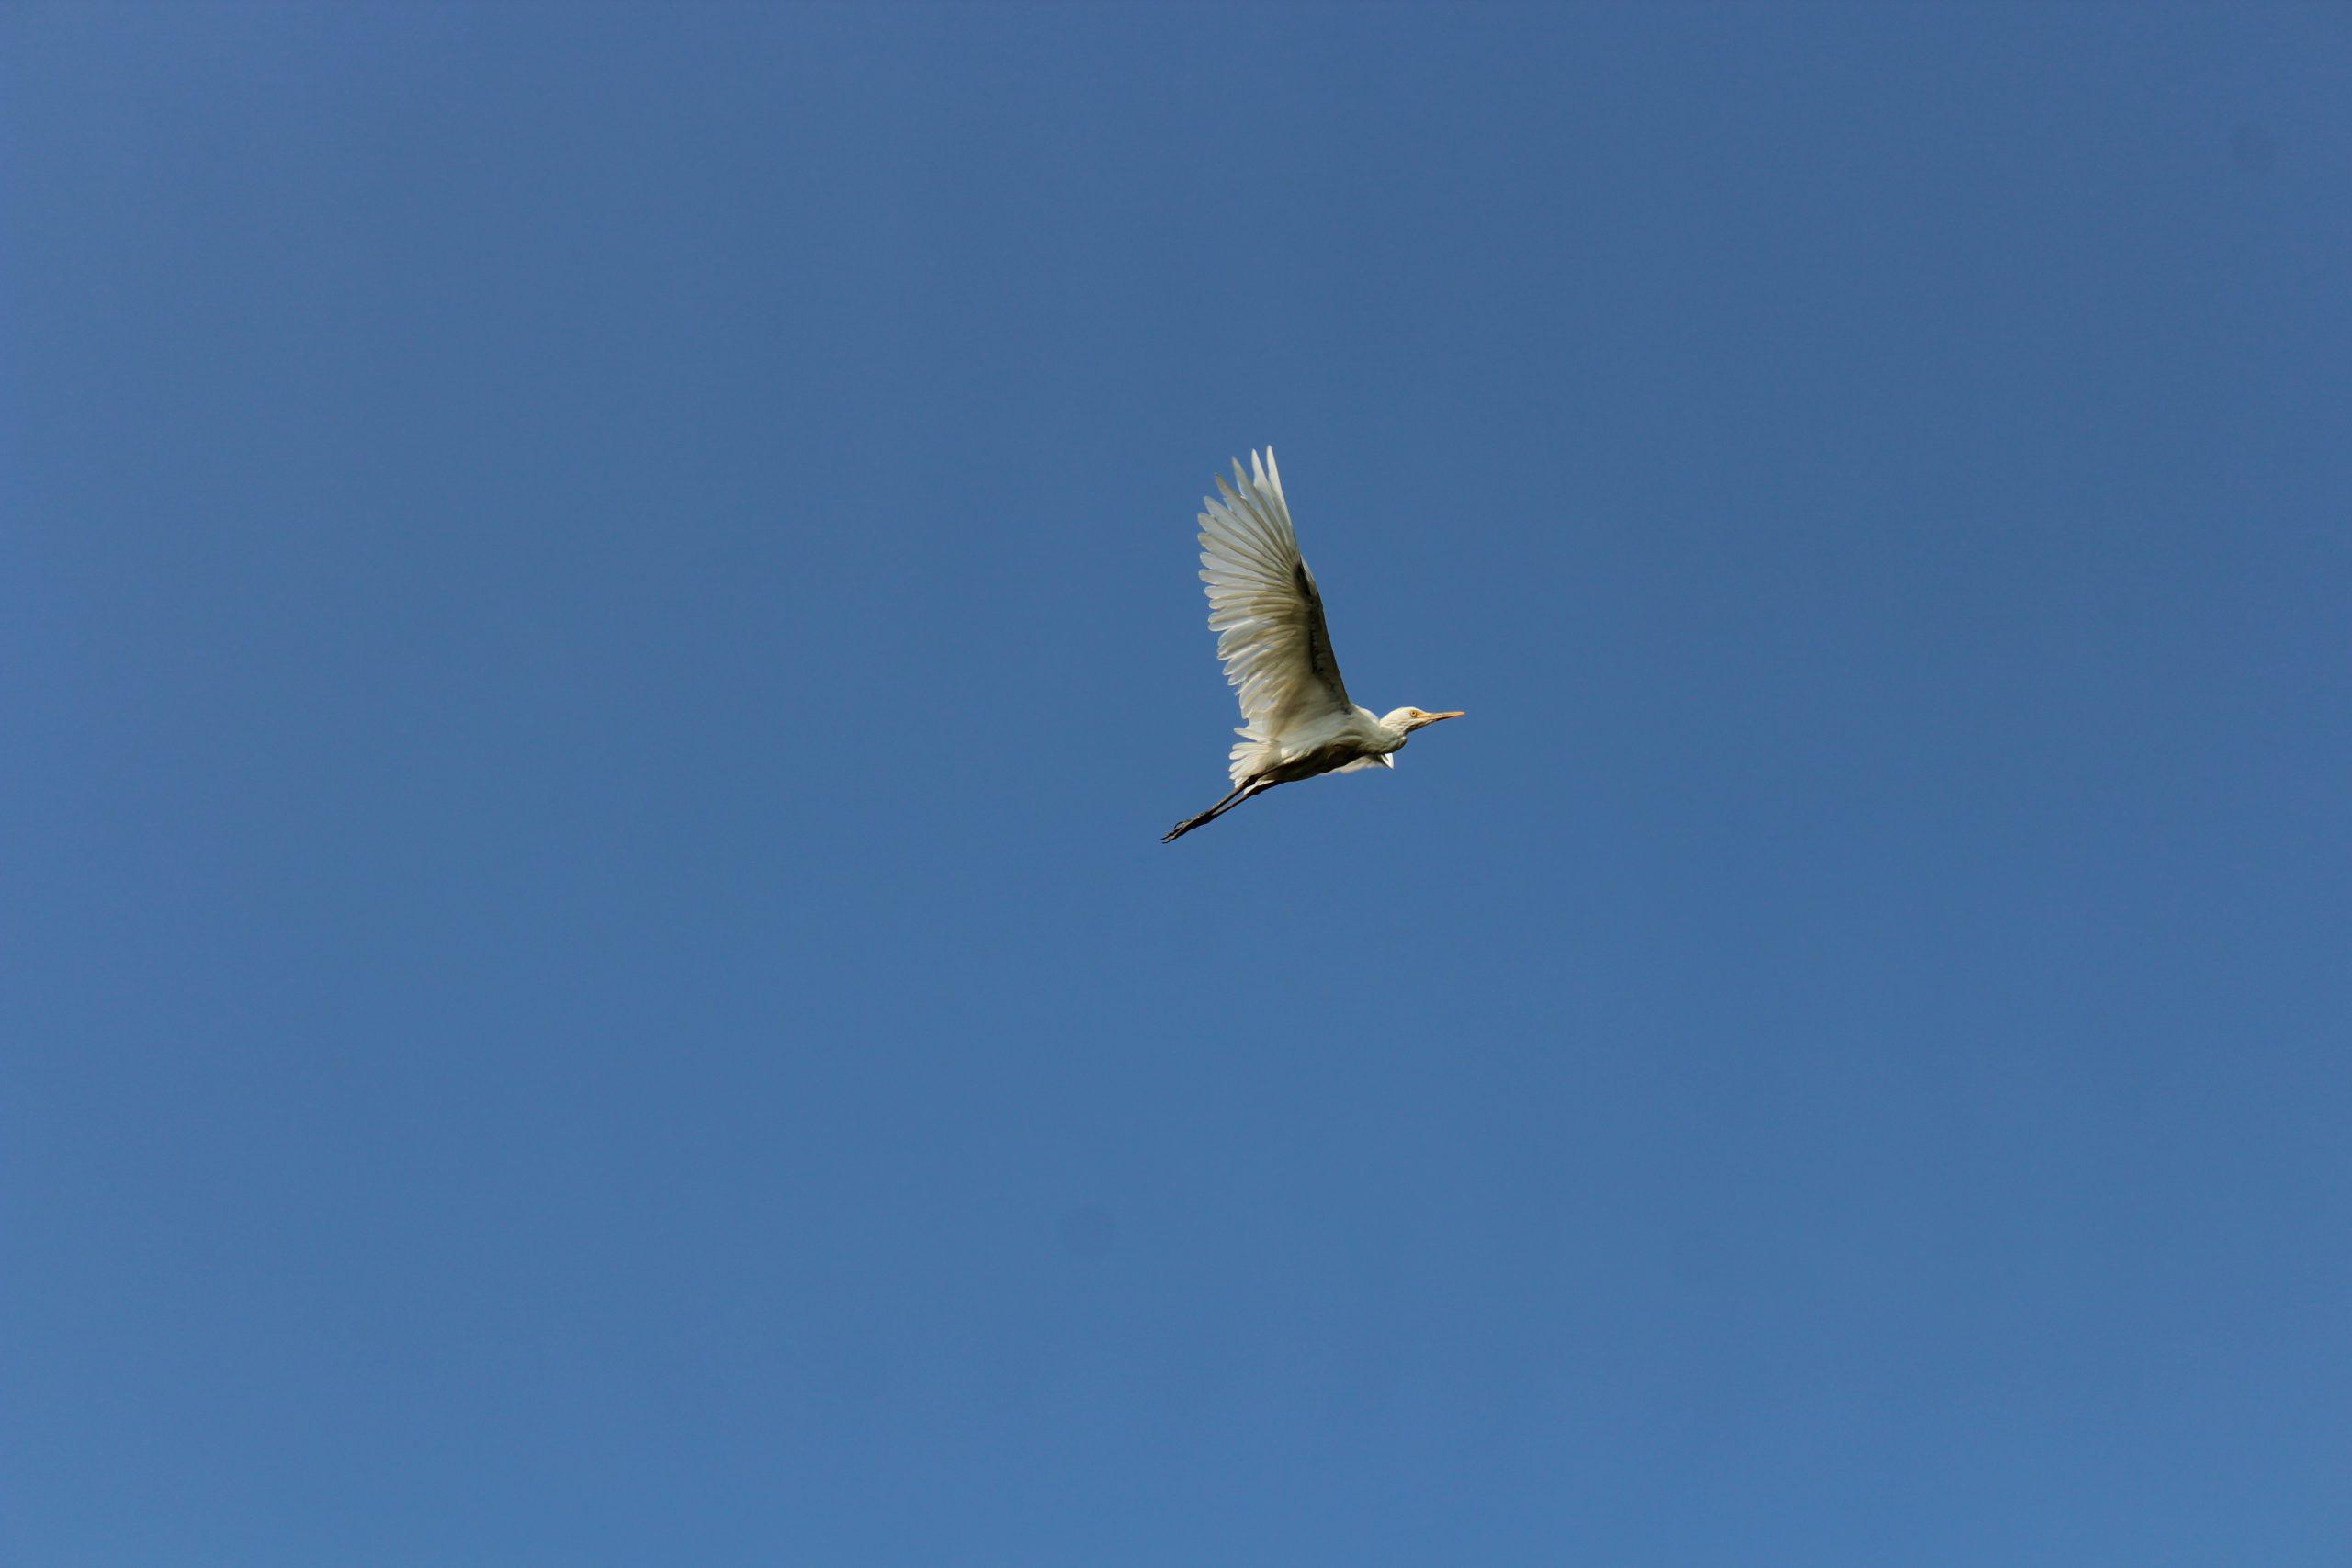 Flying Cattle Egrets